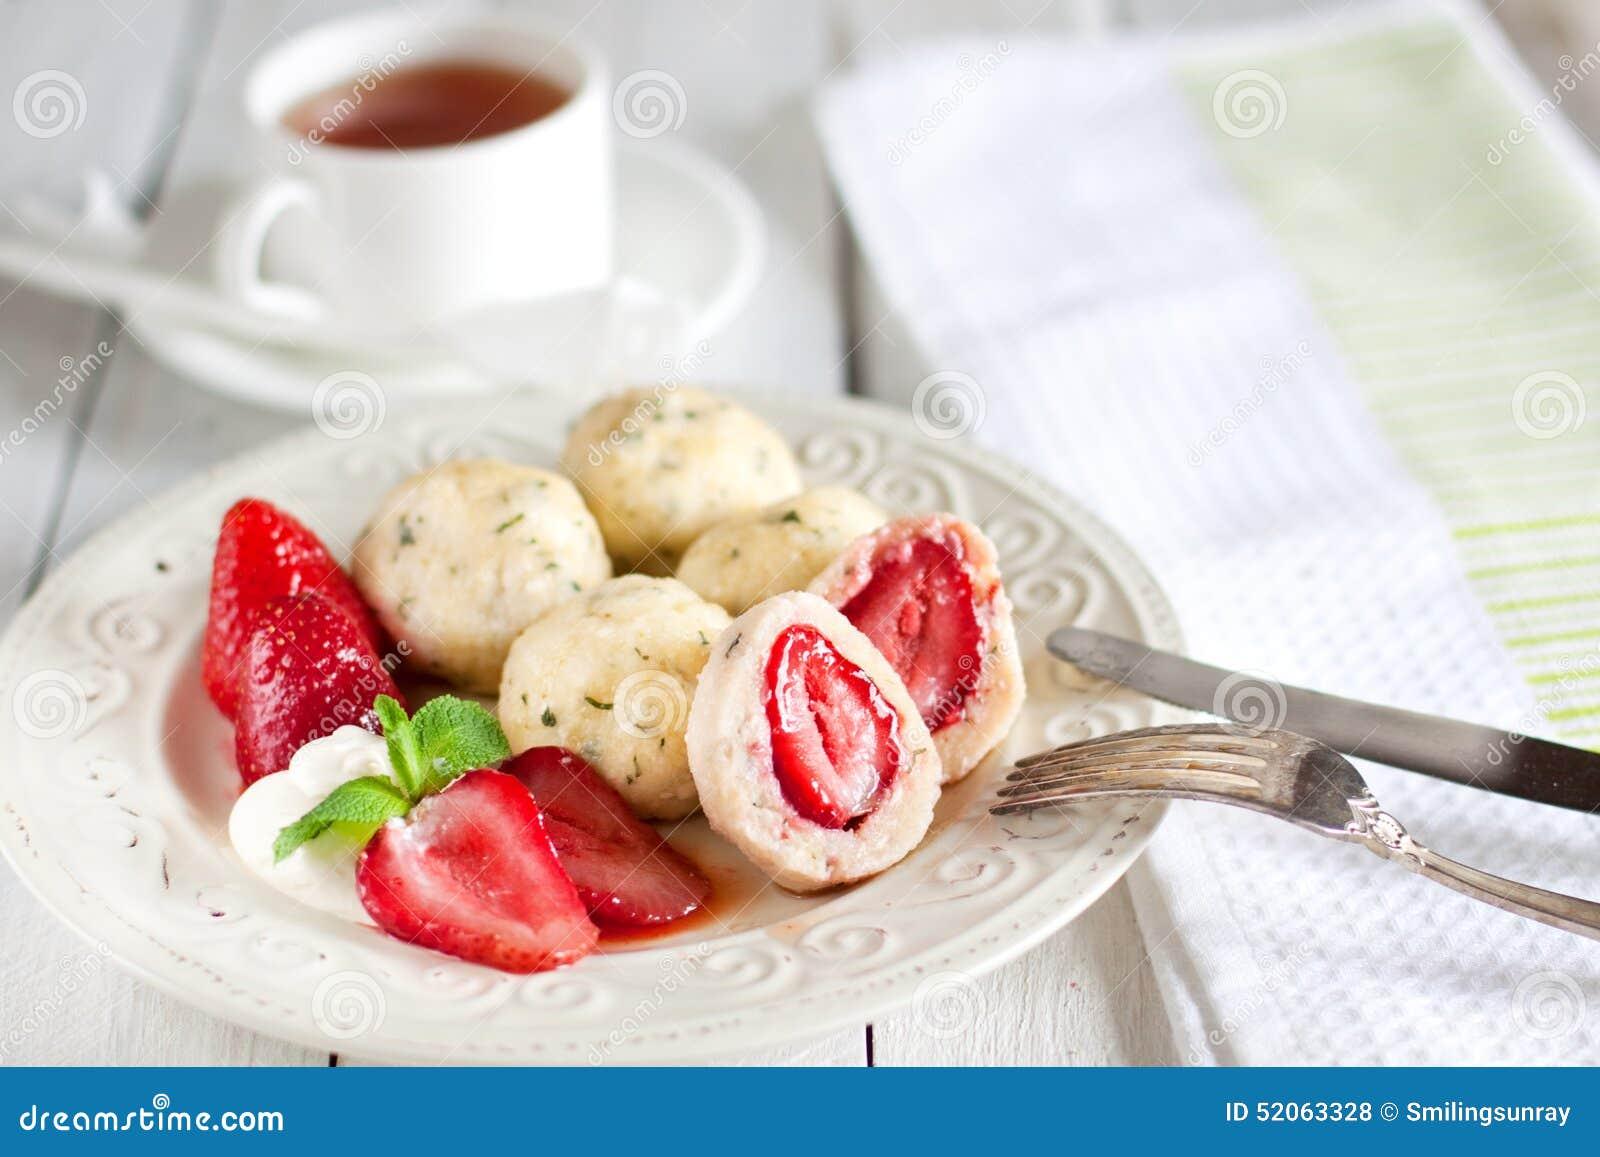 Strawberry Dumplings Stock Photo Image 52063328